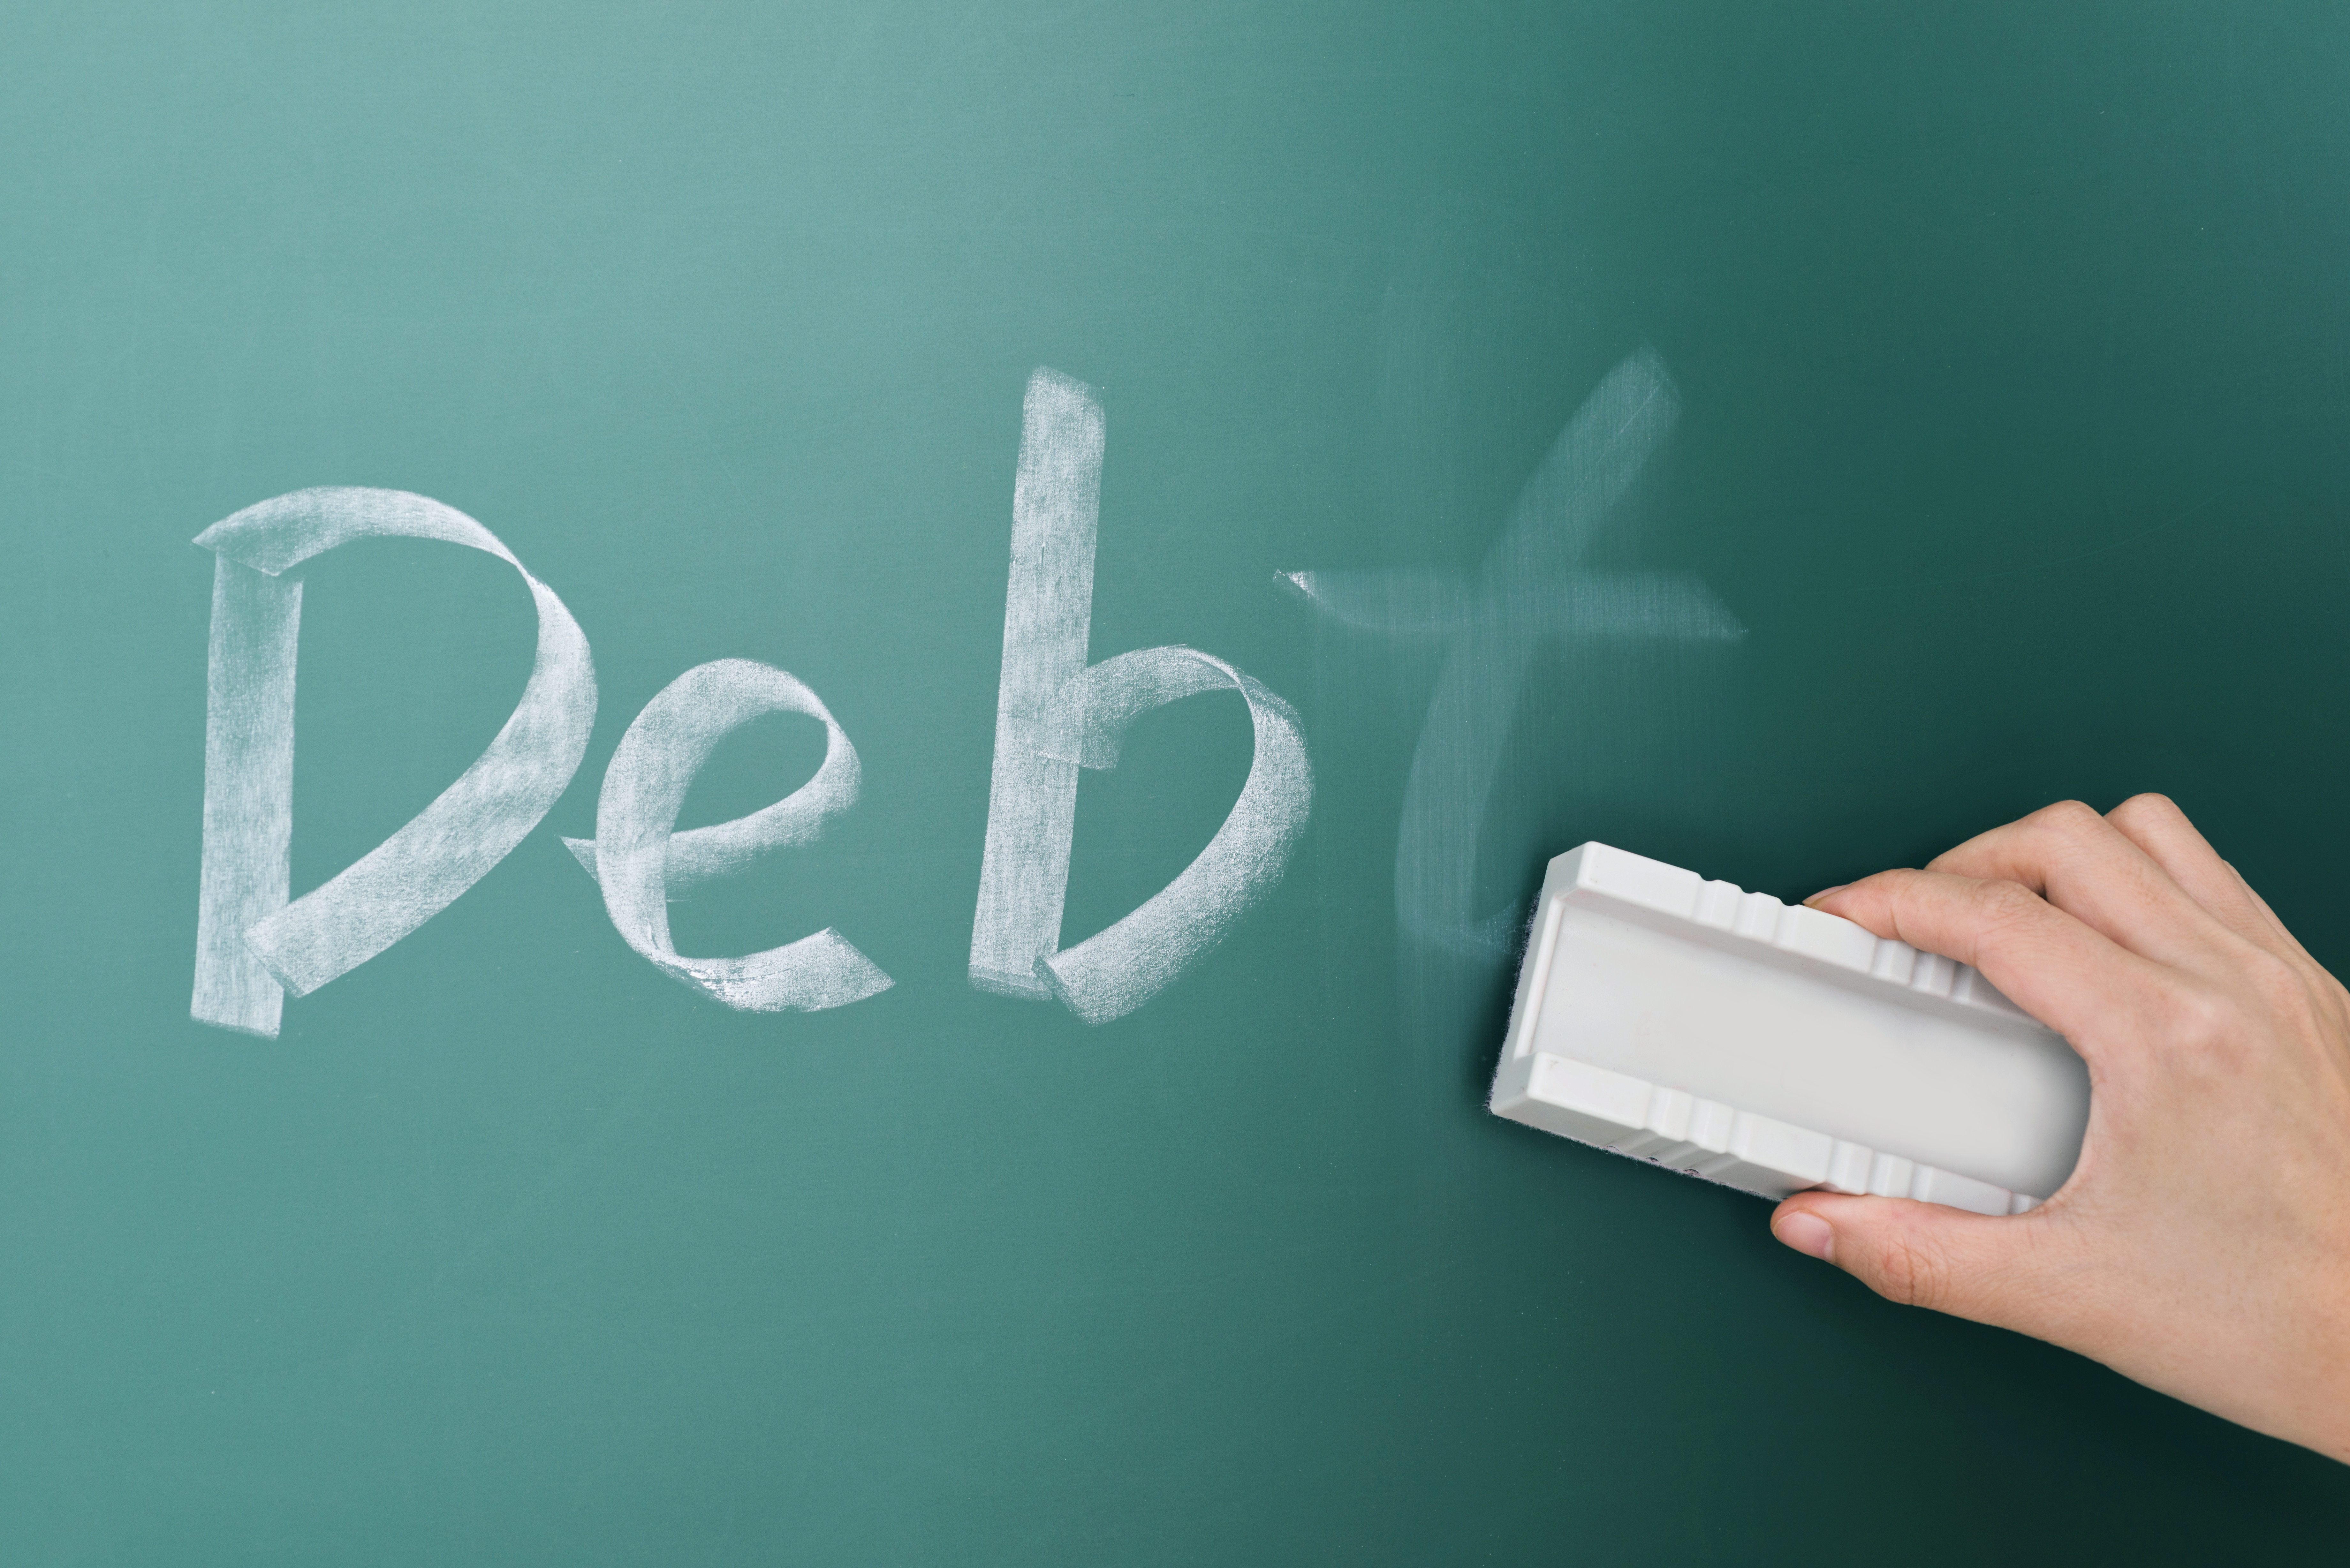 Debt Erased from Chalkboard